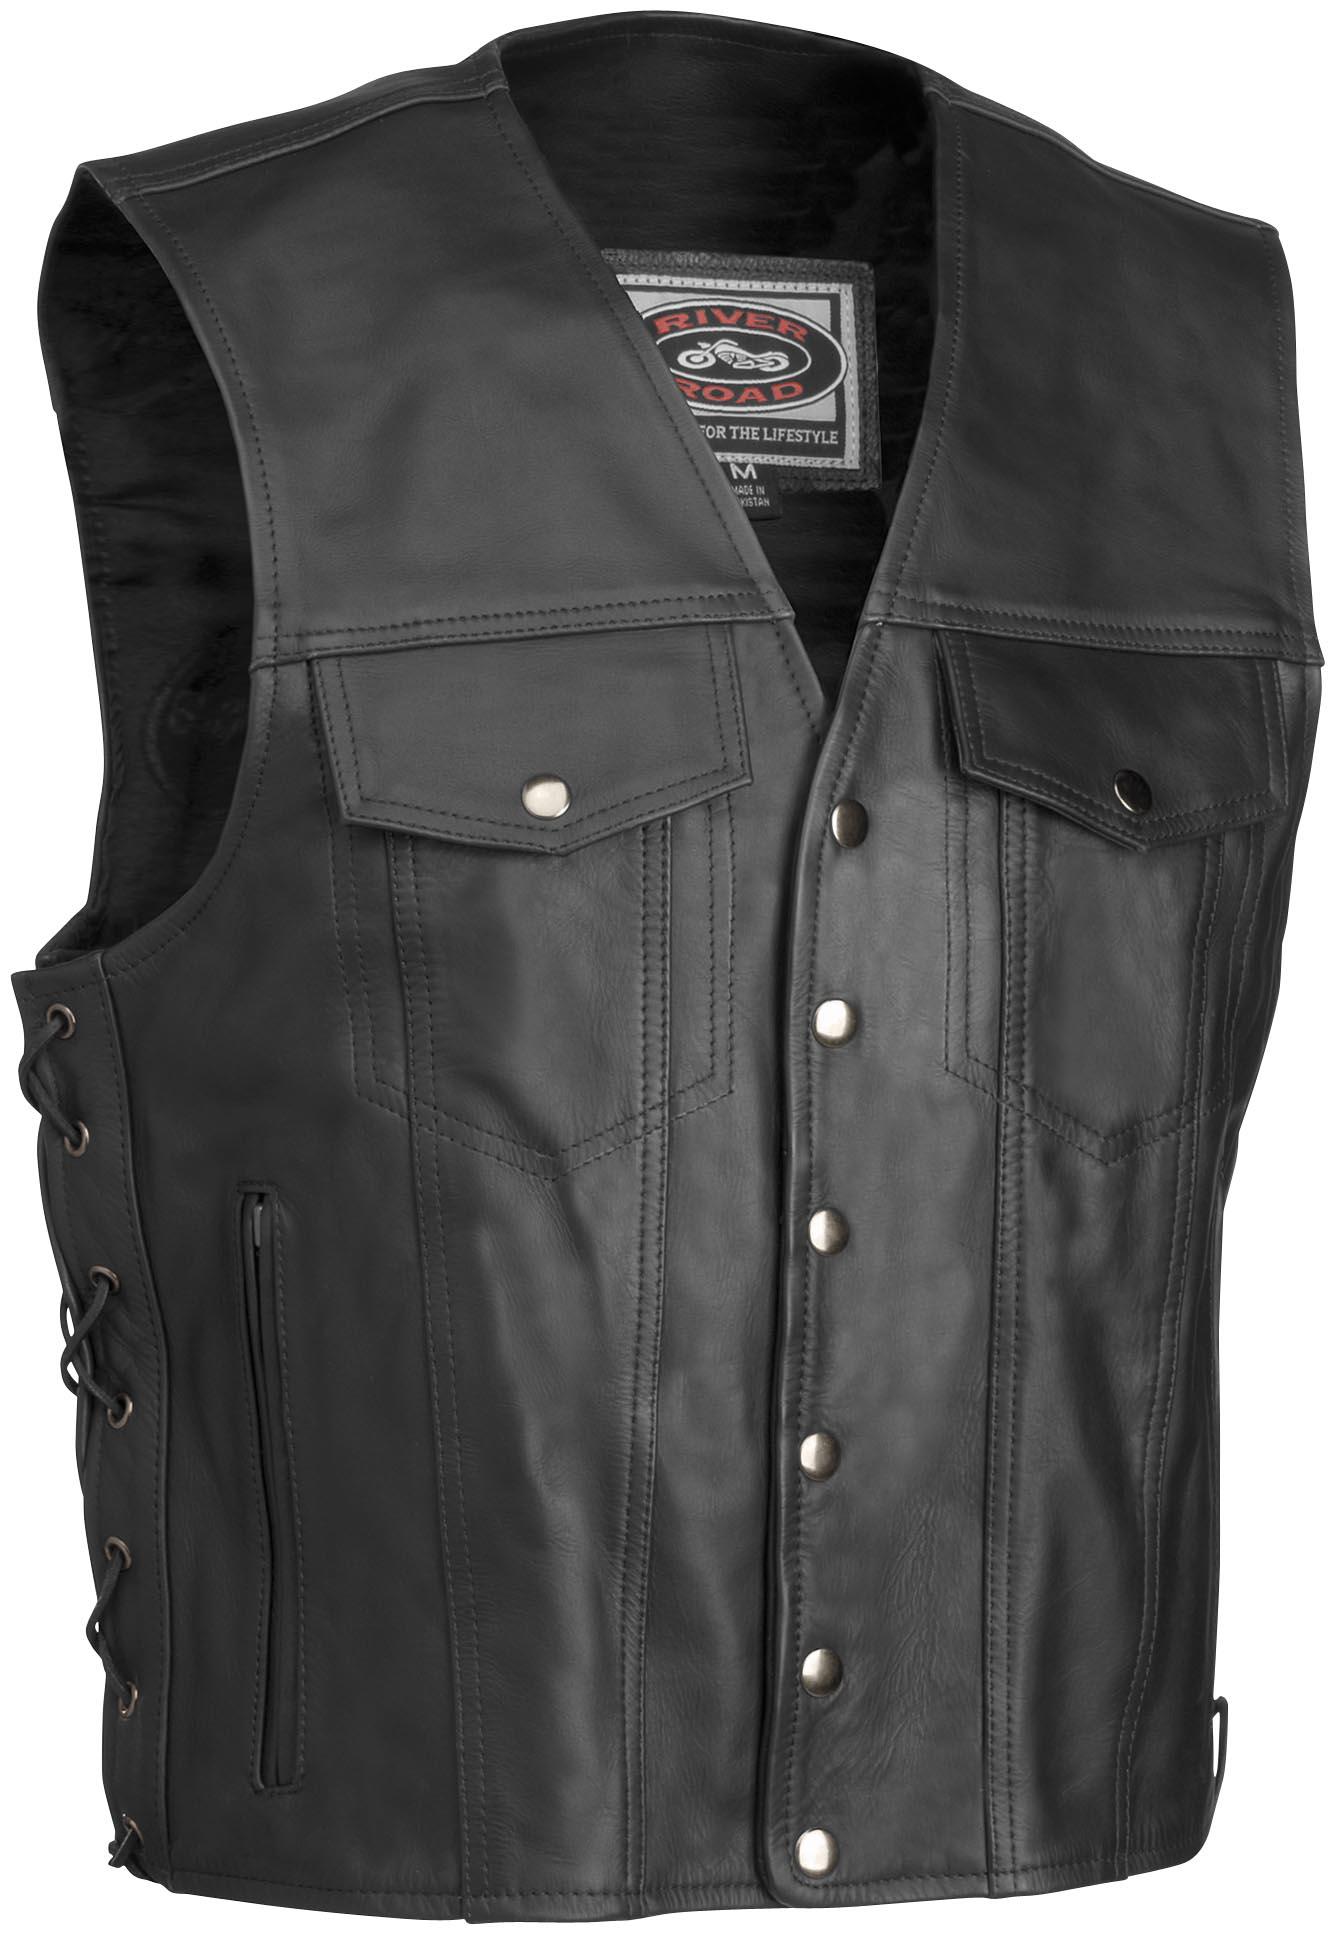 Frontier Leather Vest